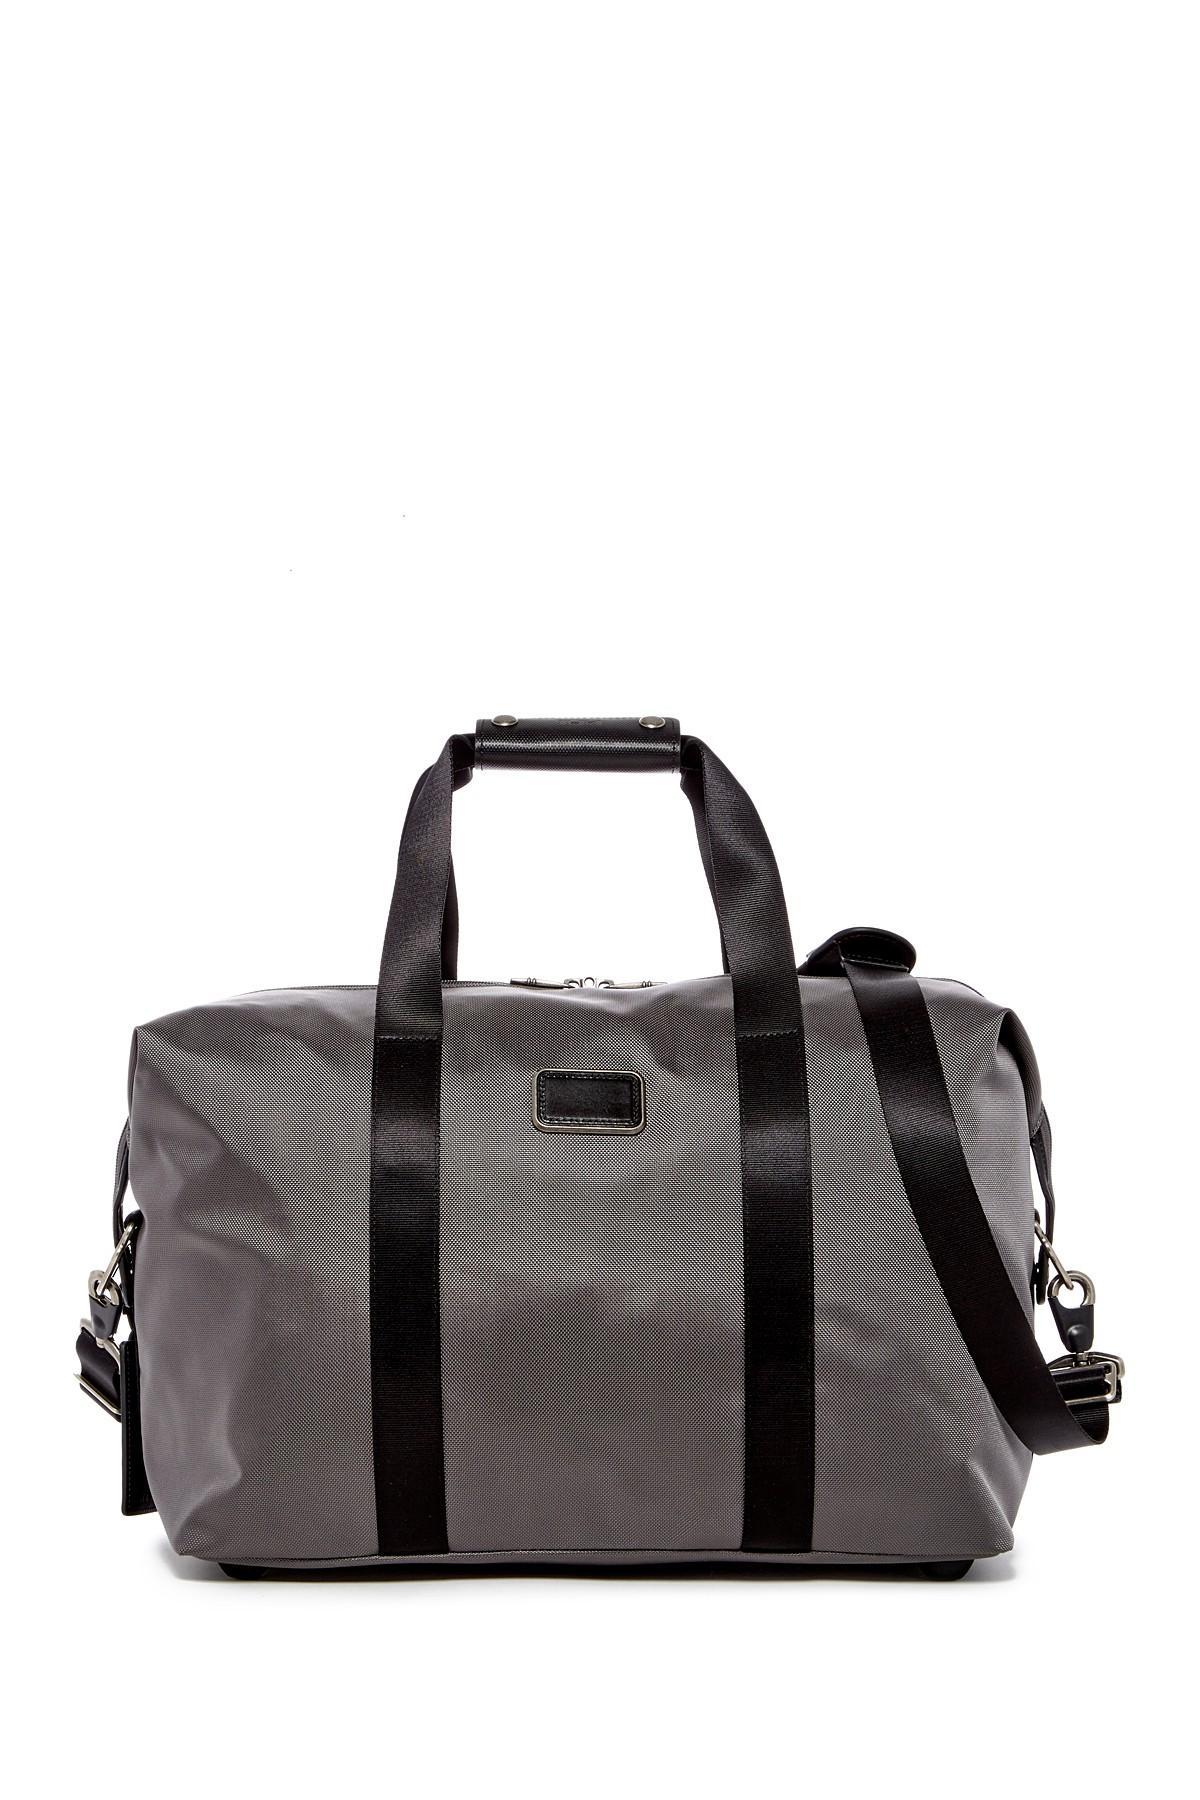 Lyst Tumi Small Soft Nylon Travel Duffle In Black For Men